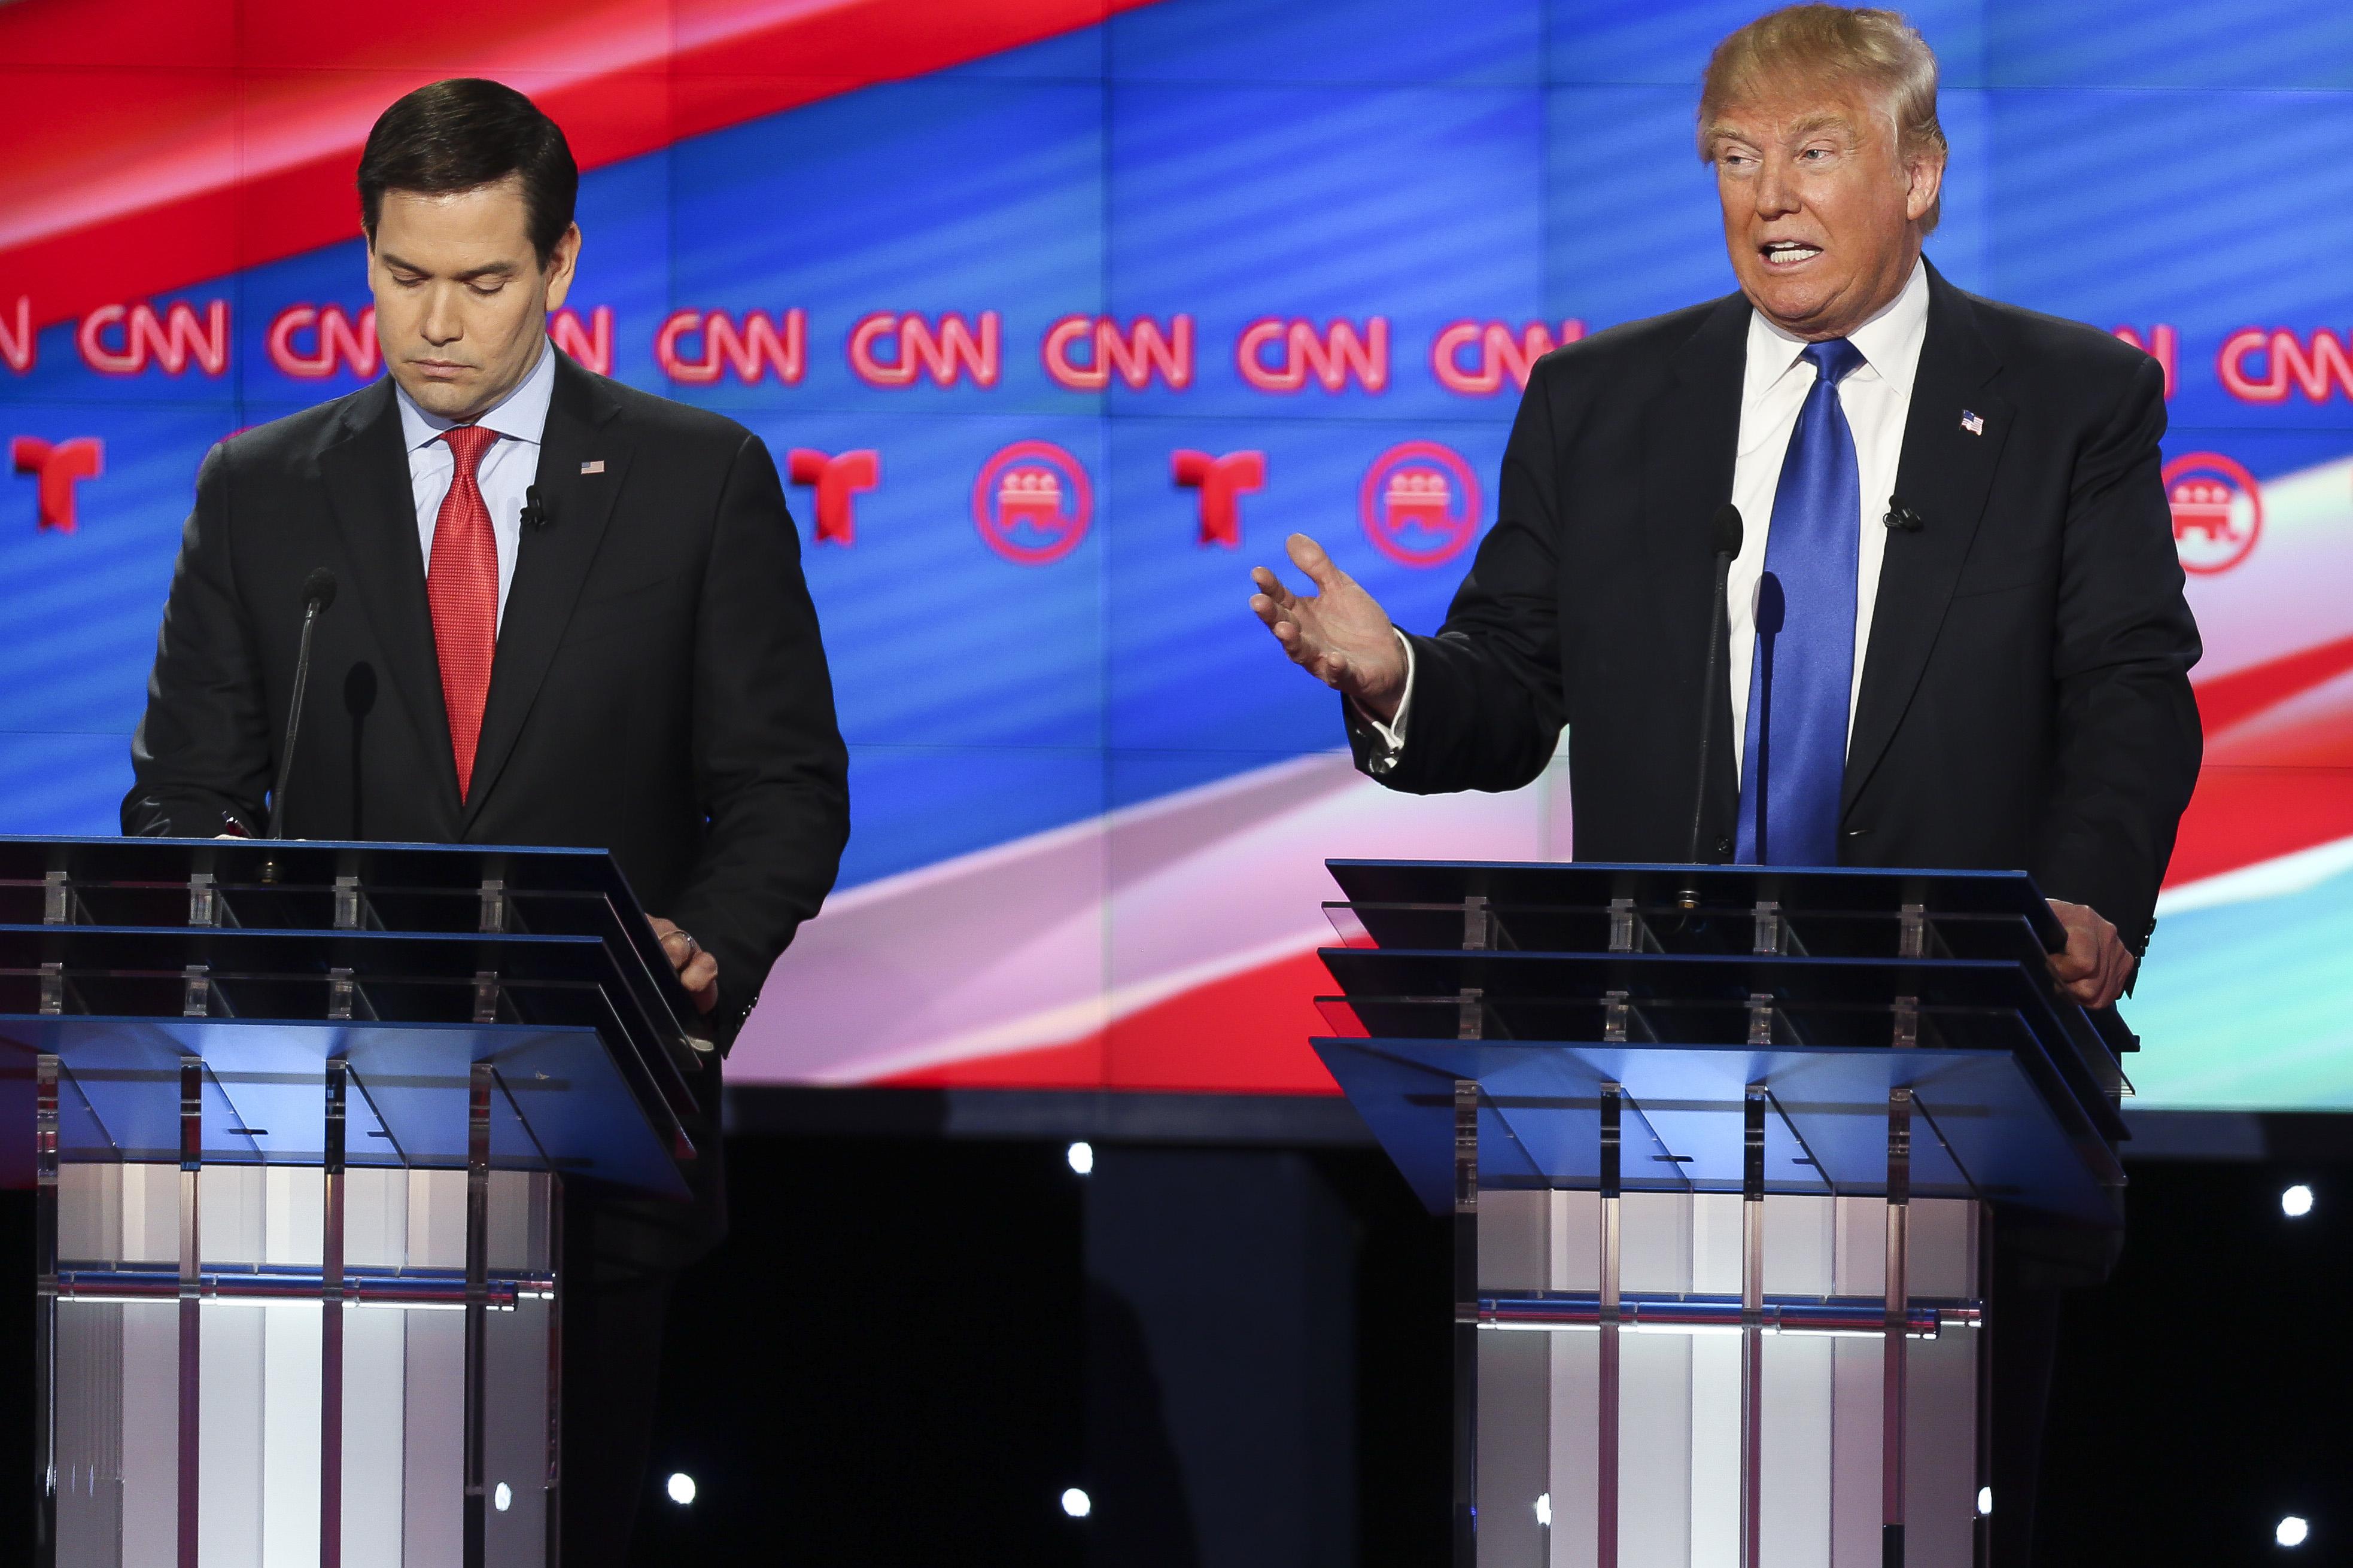 Donald Trump and Marco Rubio at the Republican debate.